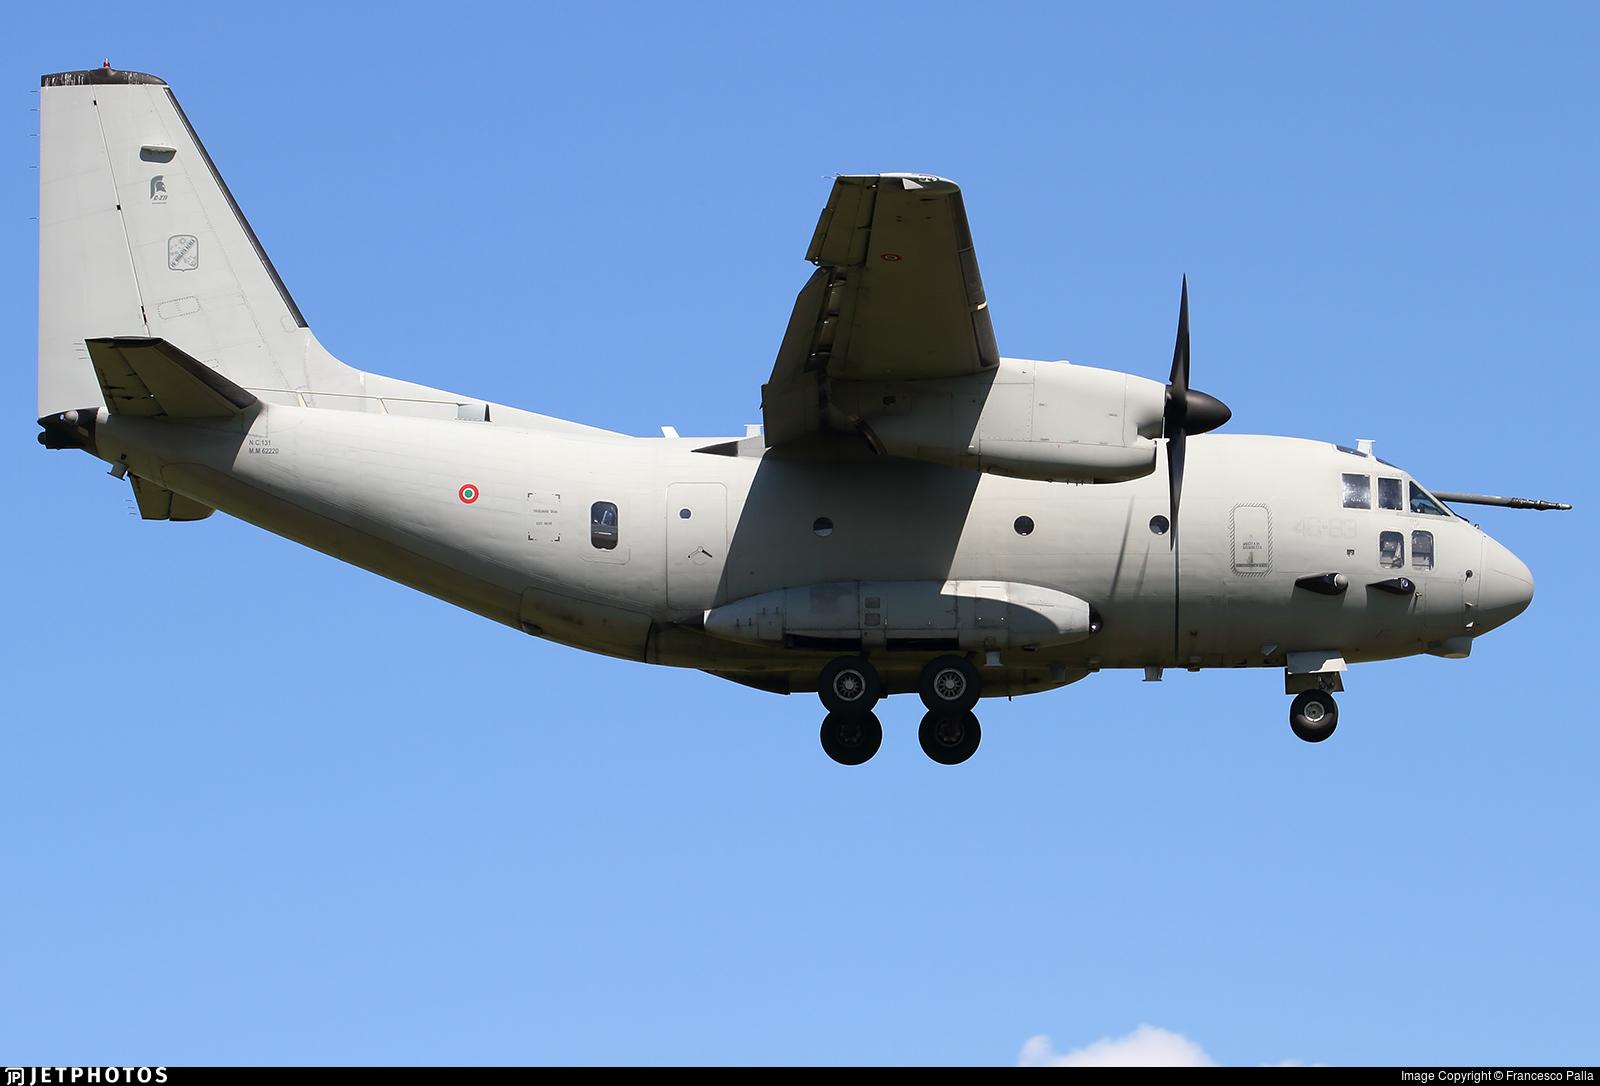 MM62220 - Alenia MC-27J Praetorian - Italy - Air Force